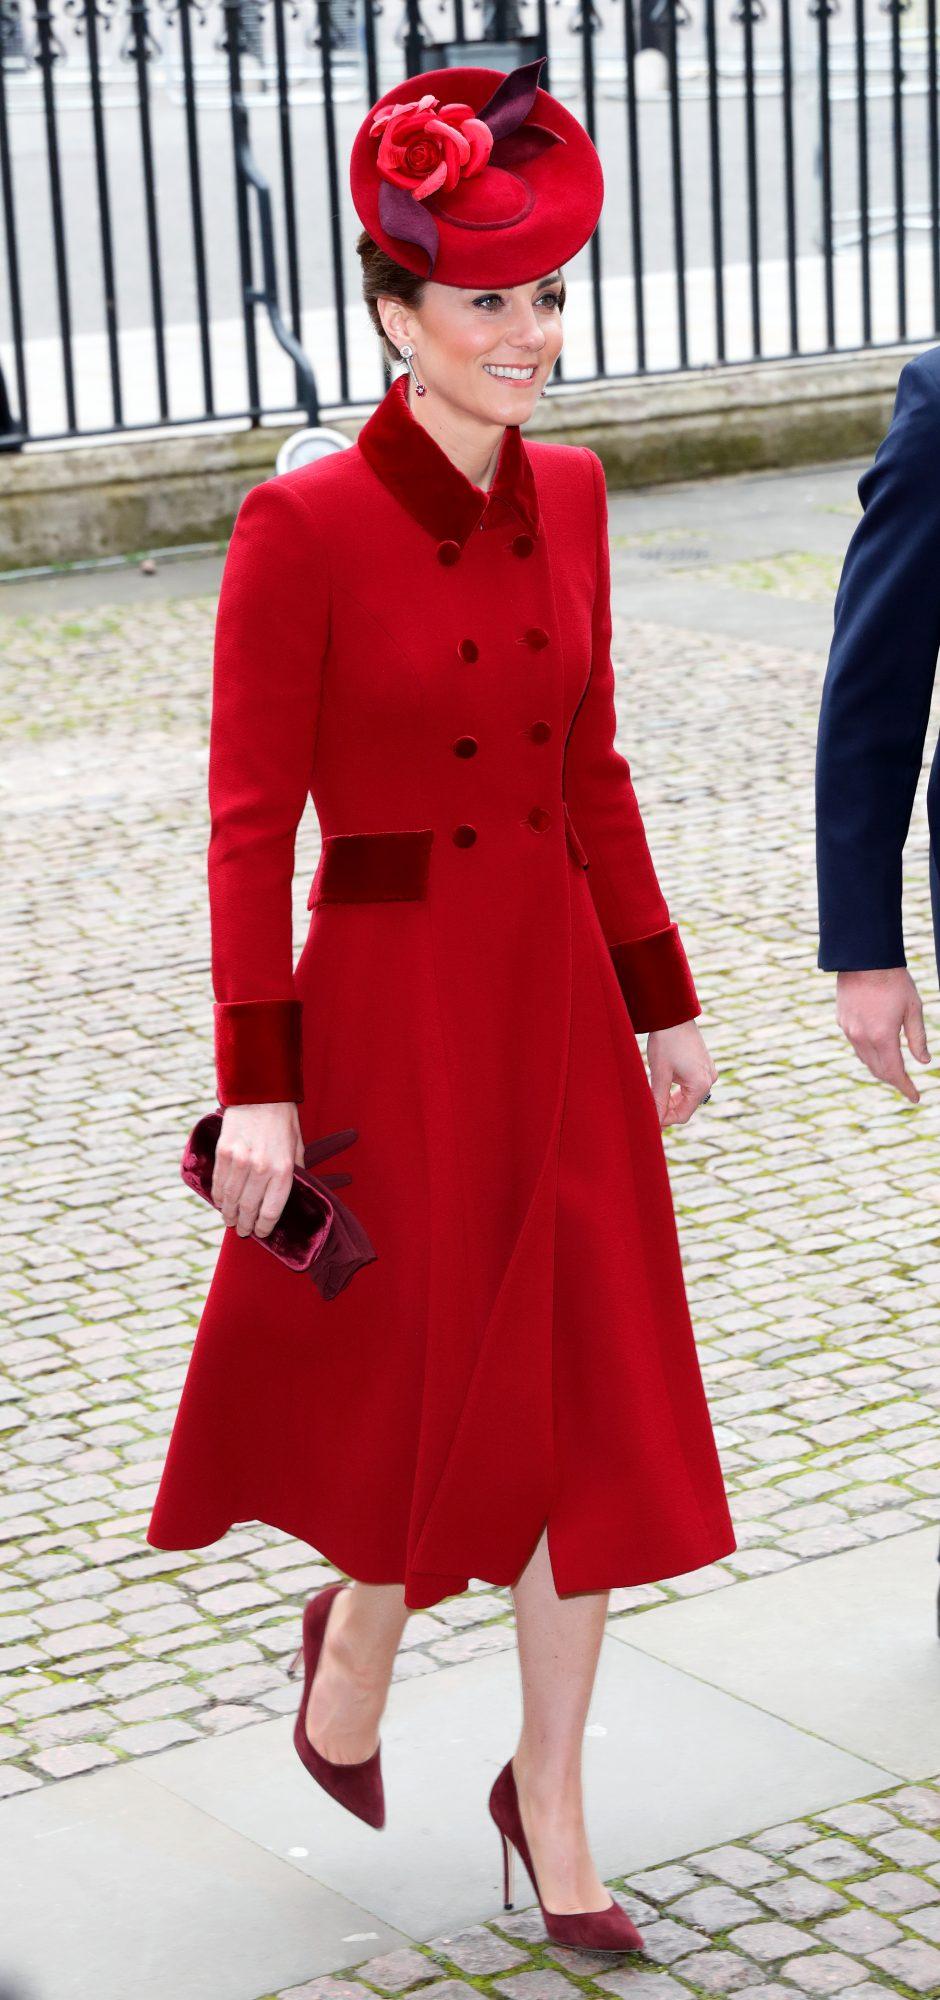 Kate Middleton, abrigo rojo, mejores looks, looks, londres